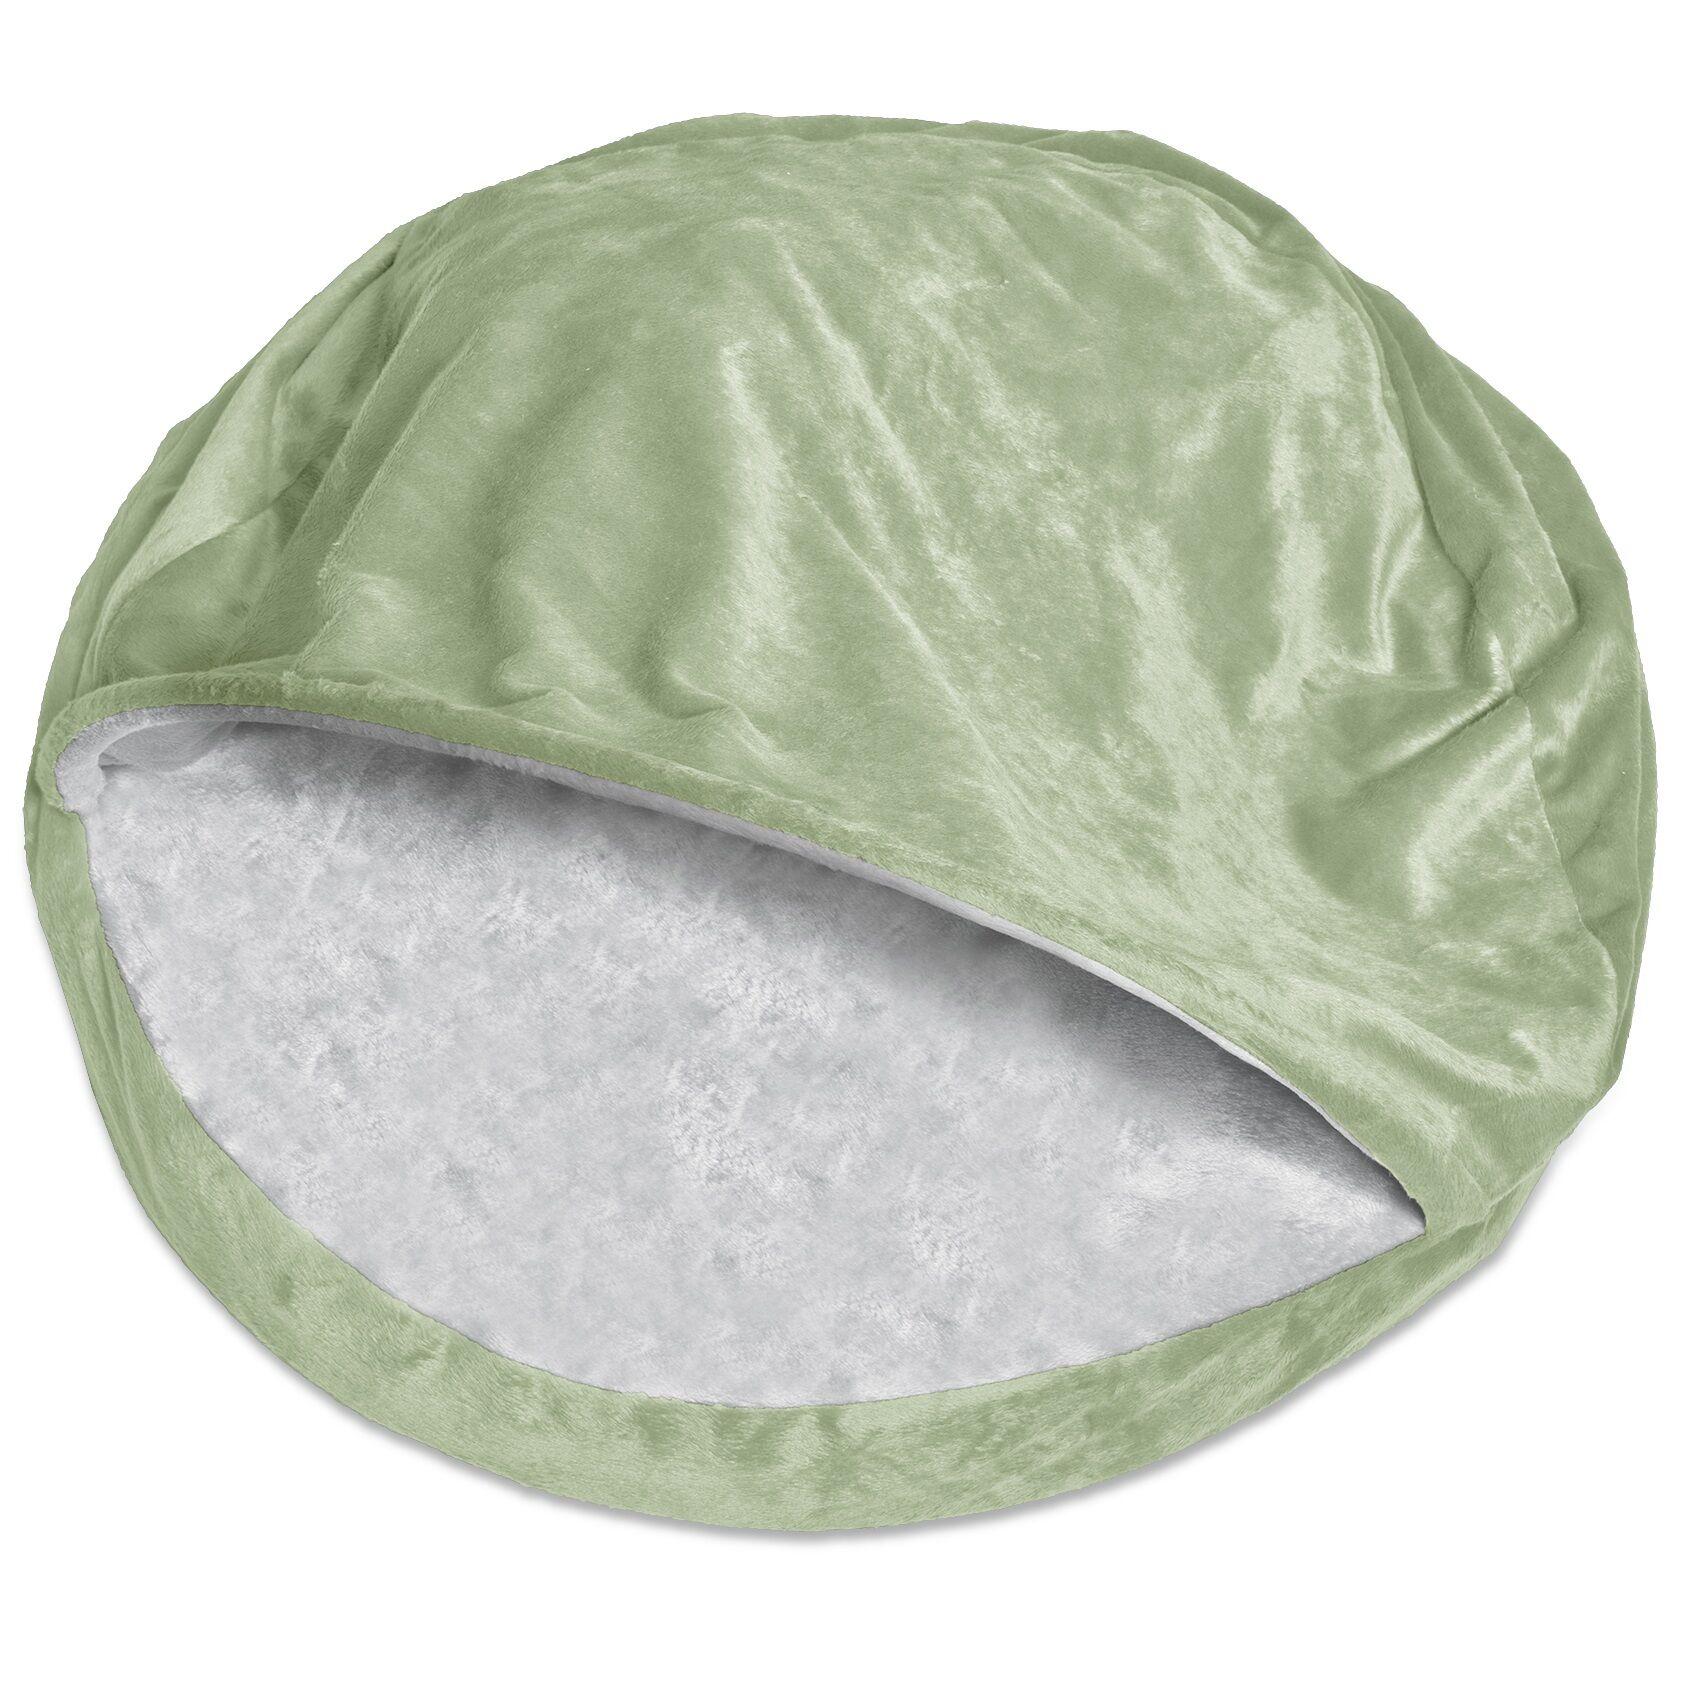 Charlotte Microvelvet Snuggly Dog Cave Bed Hooded Color: Sage, Size: Large (35